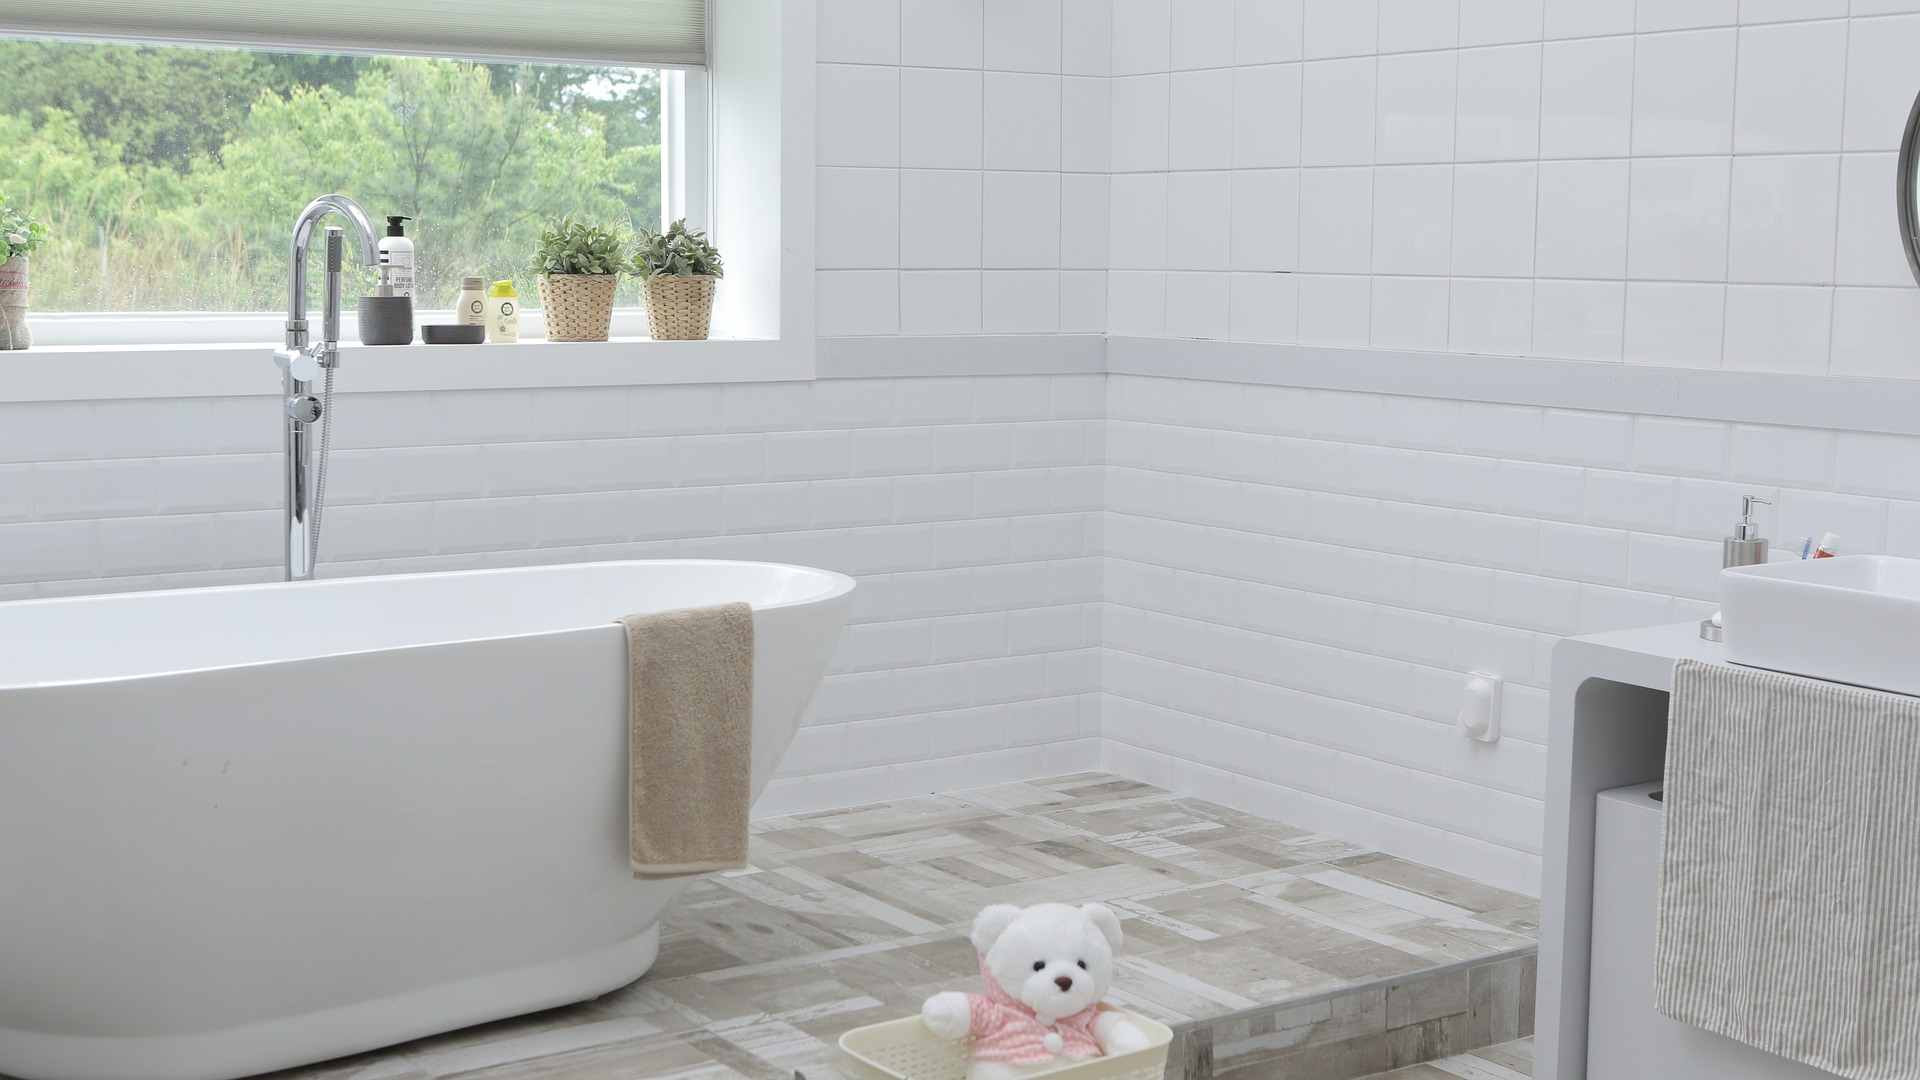 bathroom-1872193_1920.jpg